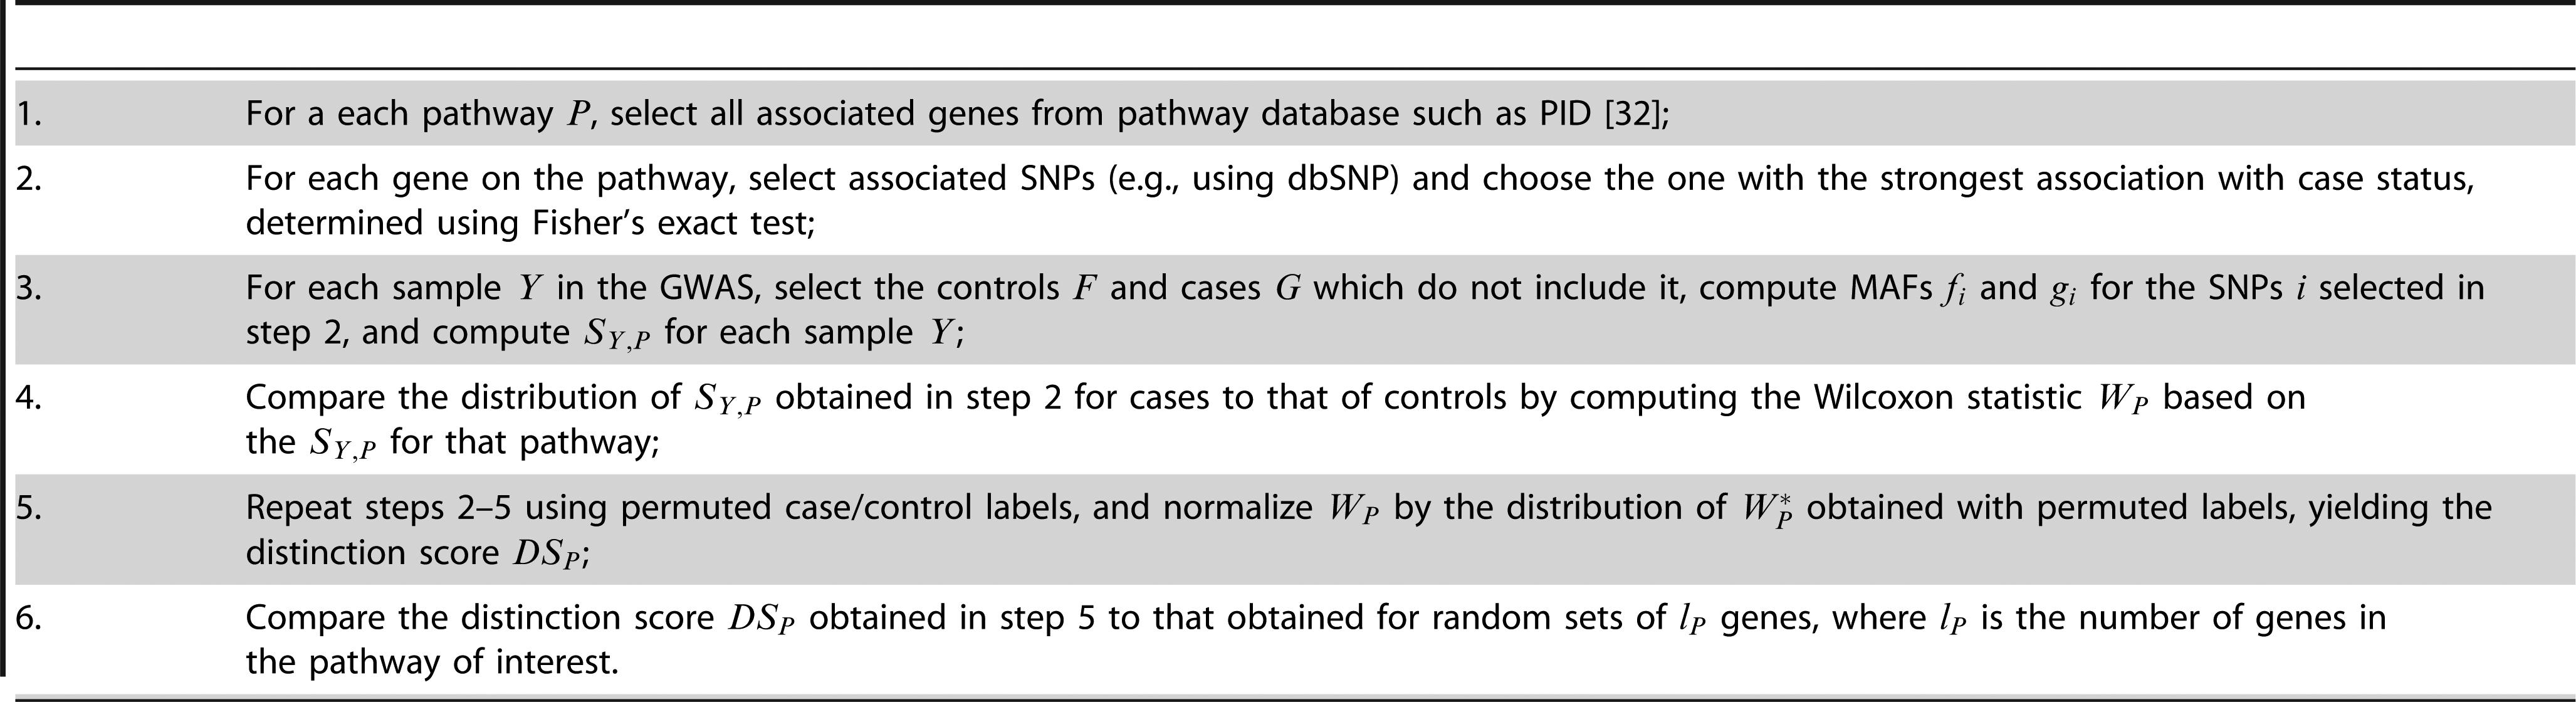 Procedure for Pathways of Distinction Analysis.